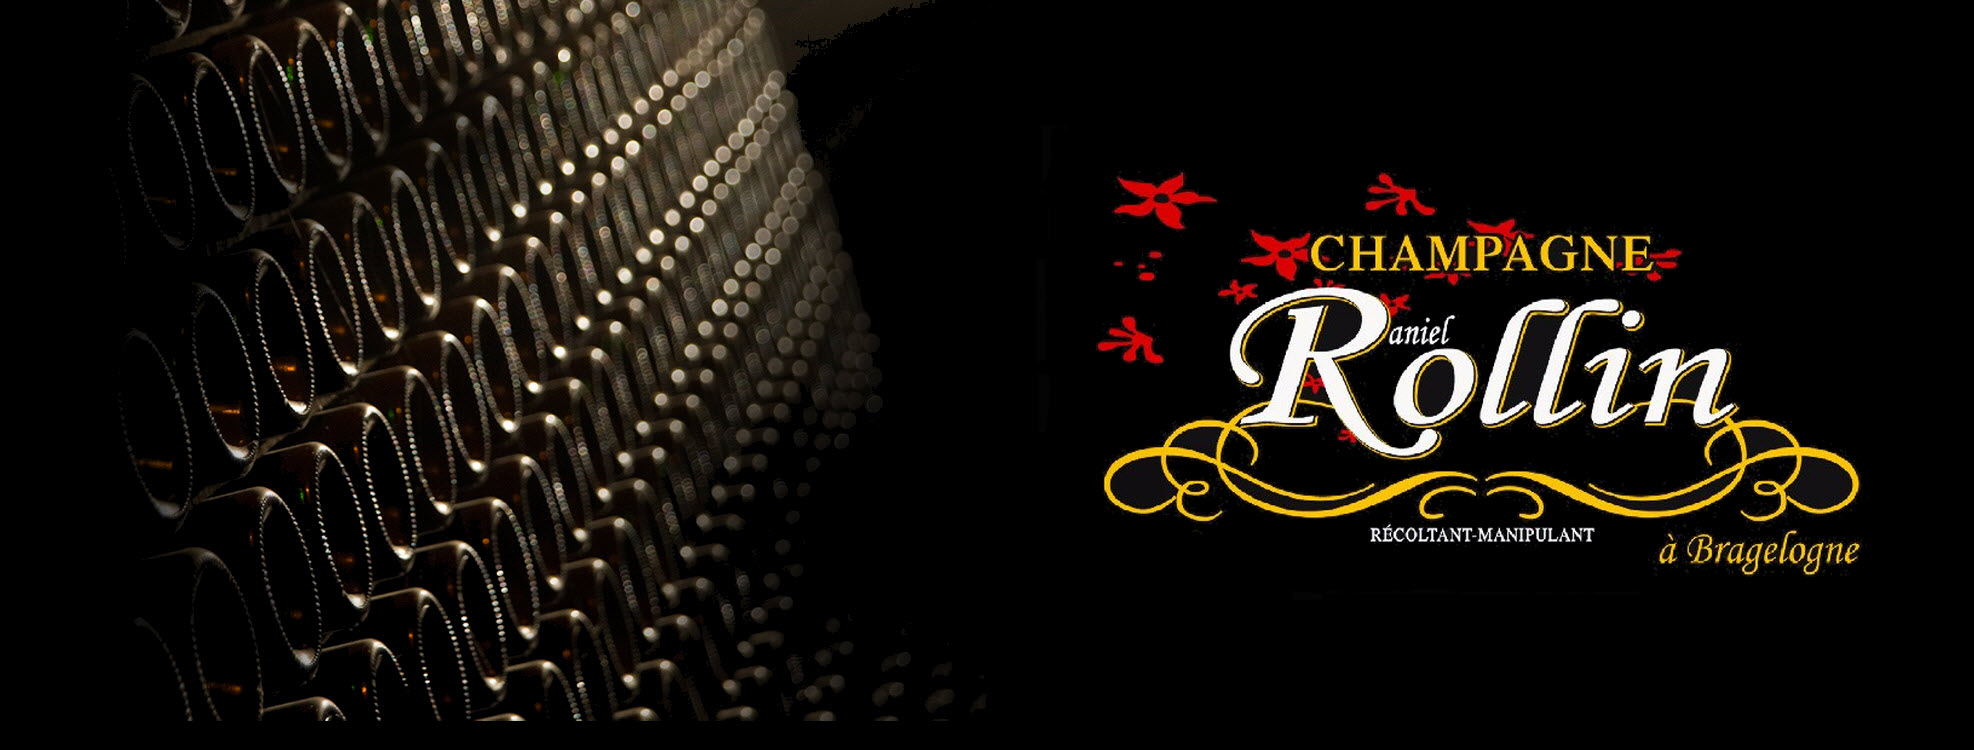 Champagne Daniel Rollin